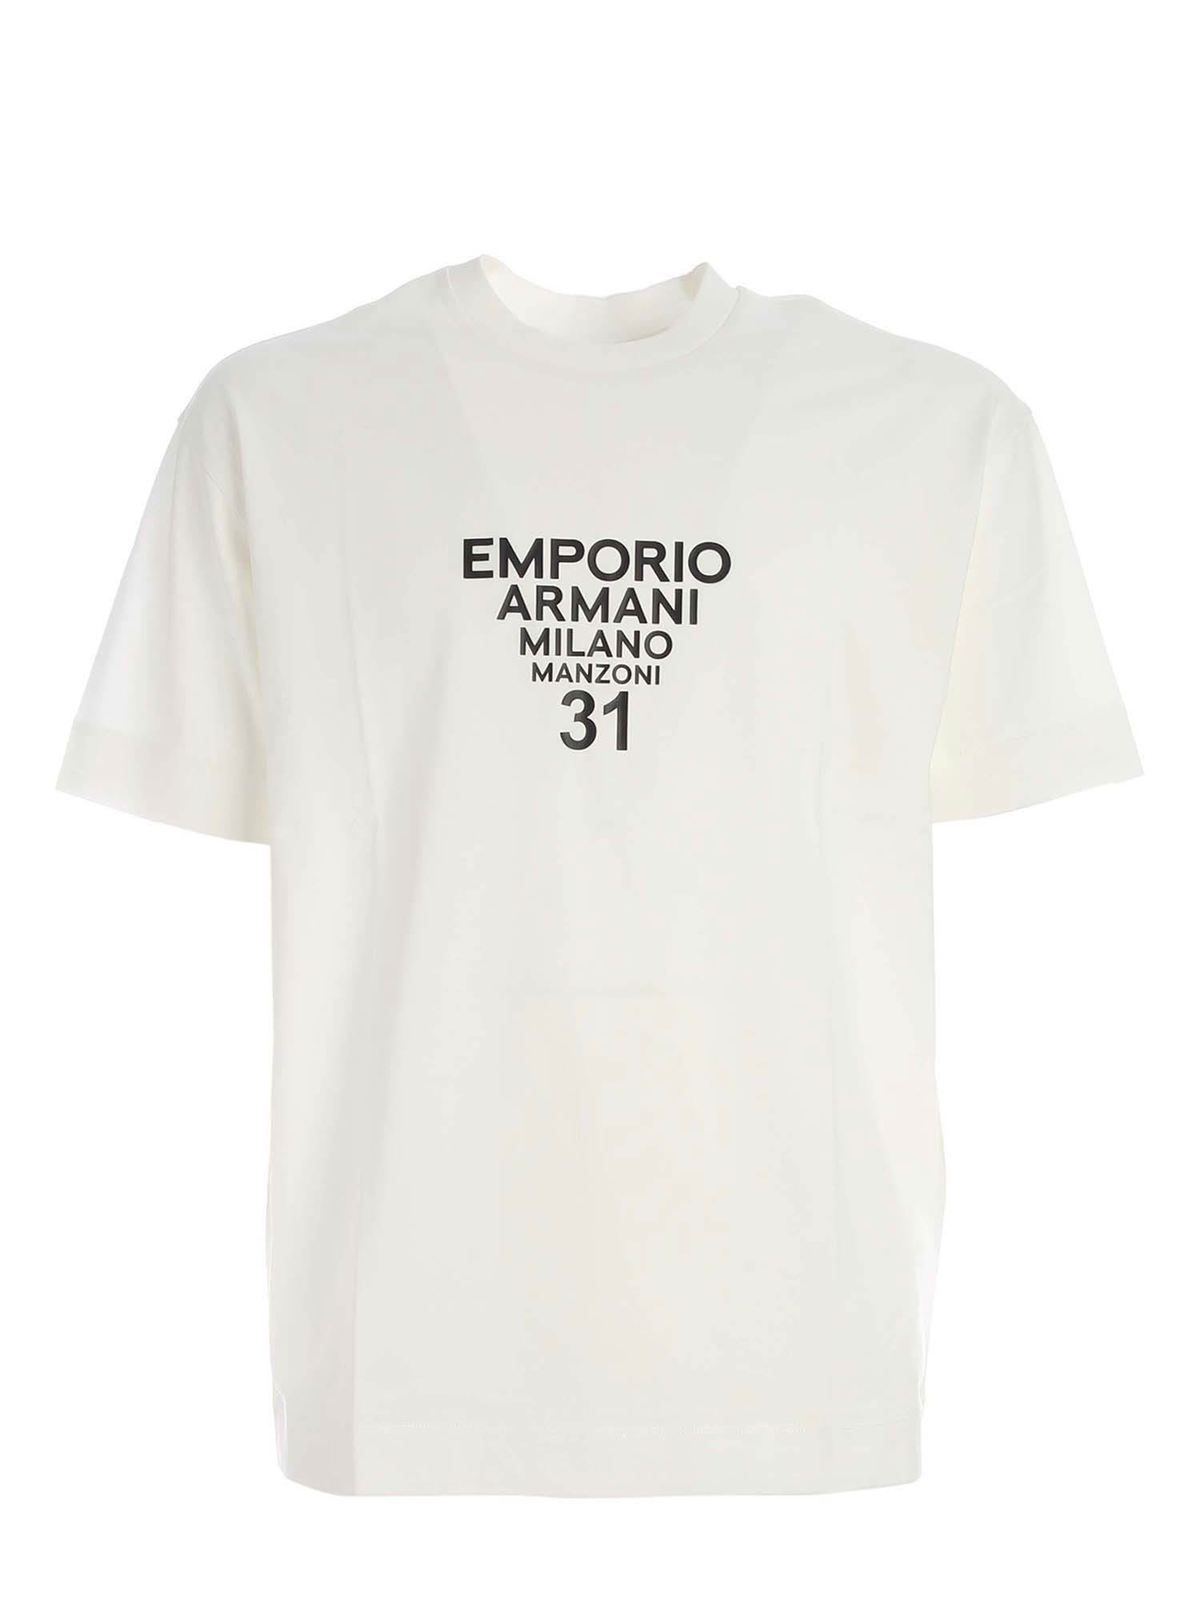 Emporio Armani BLACK LOGO PRINT T-SHIRT IN WHITE